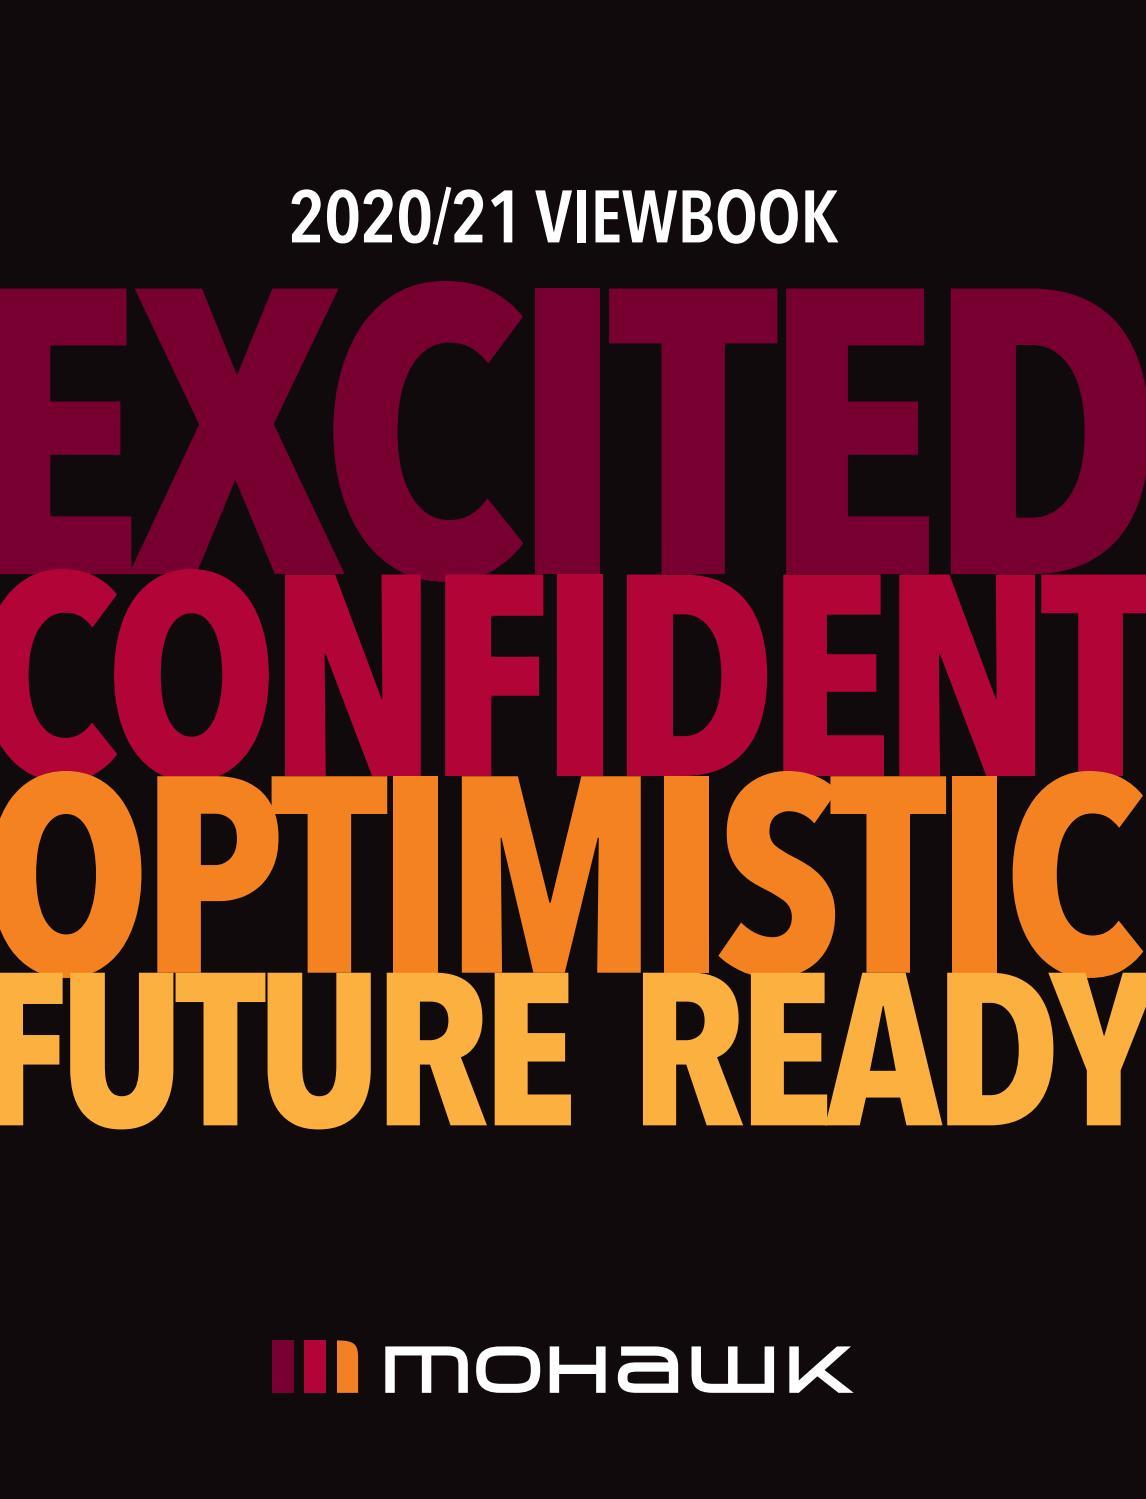 Mohawk College 2020 21 Viewbook By Mohawk College Issuu